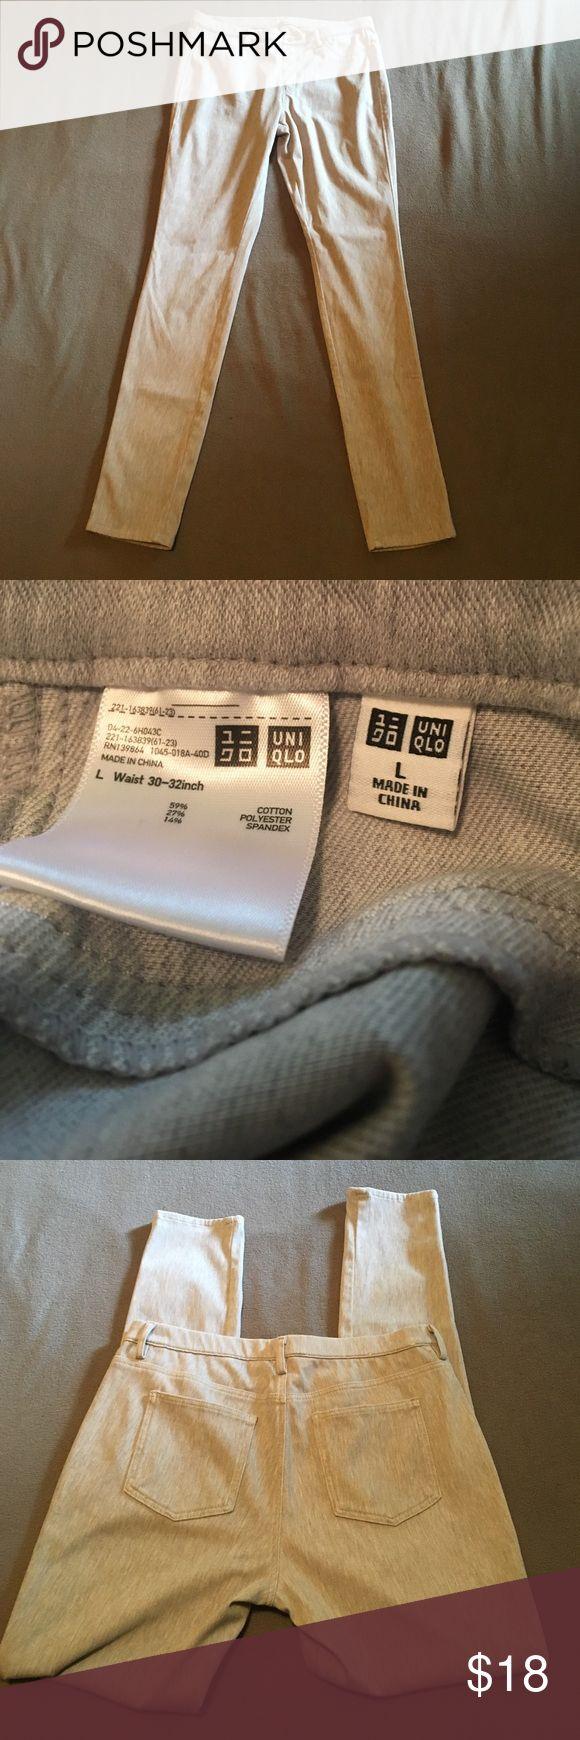 Uniqlo leggings size 30-32 gray women's trousers Used clean barely worn uniqlo leggings size 30 or 32 large we ship fast www.selvedgeseitz.com Uniqlo Pants Leggings